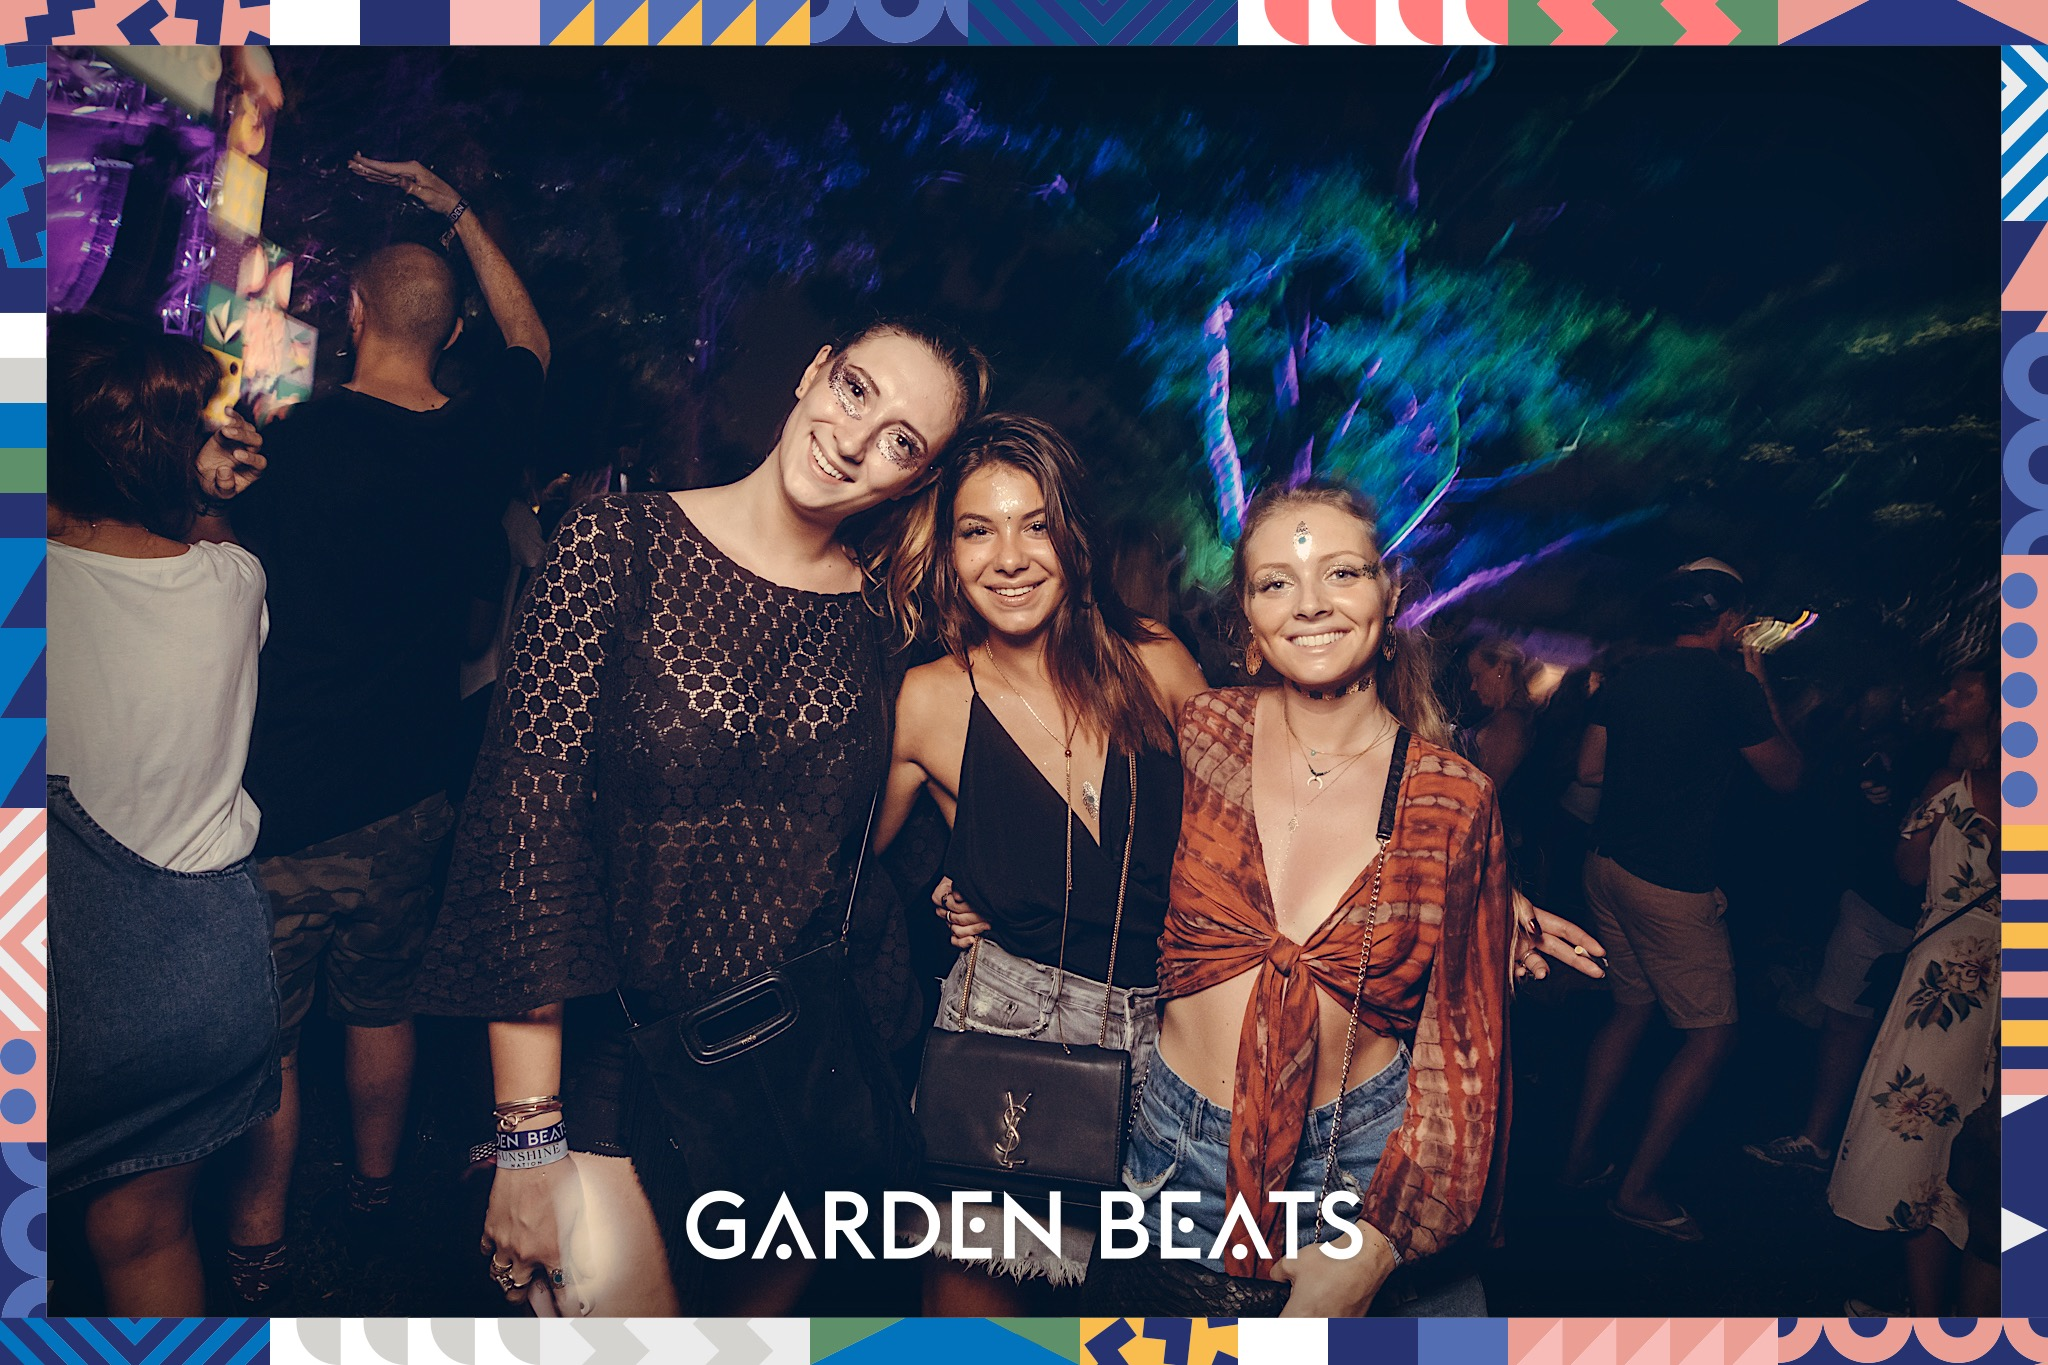 03032018_GardenBeats_Colossal830_Watermarked.jpg